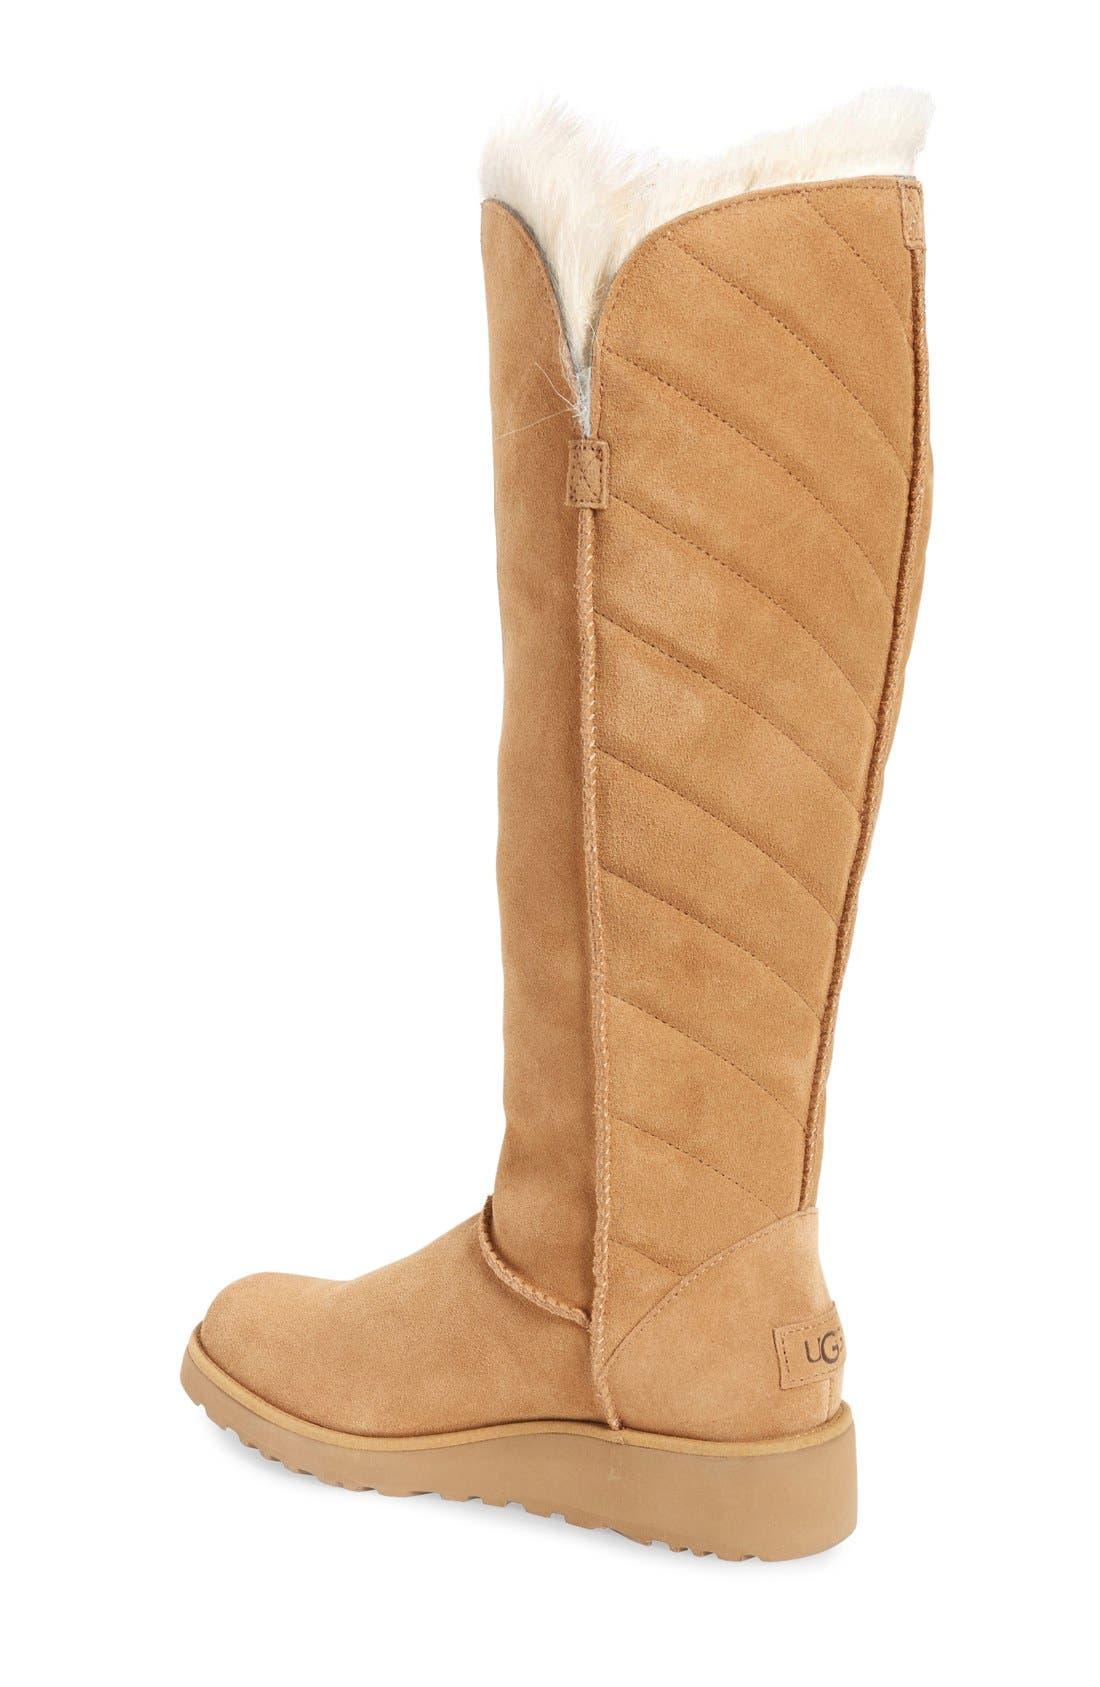 Alternate Image 2  - UGG® 'Rosalind' Tall Boot (Women)